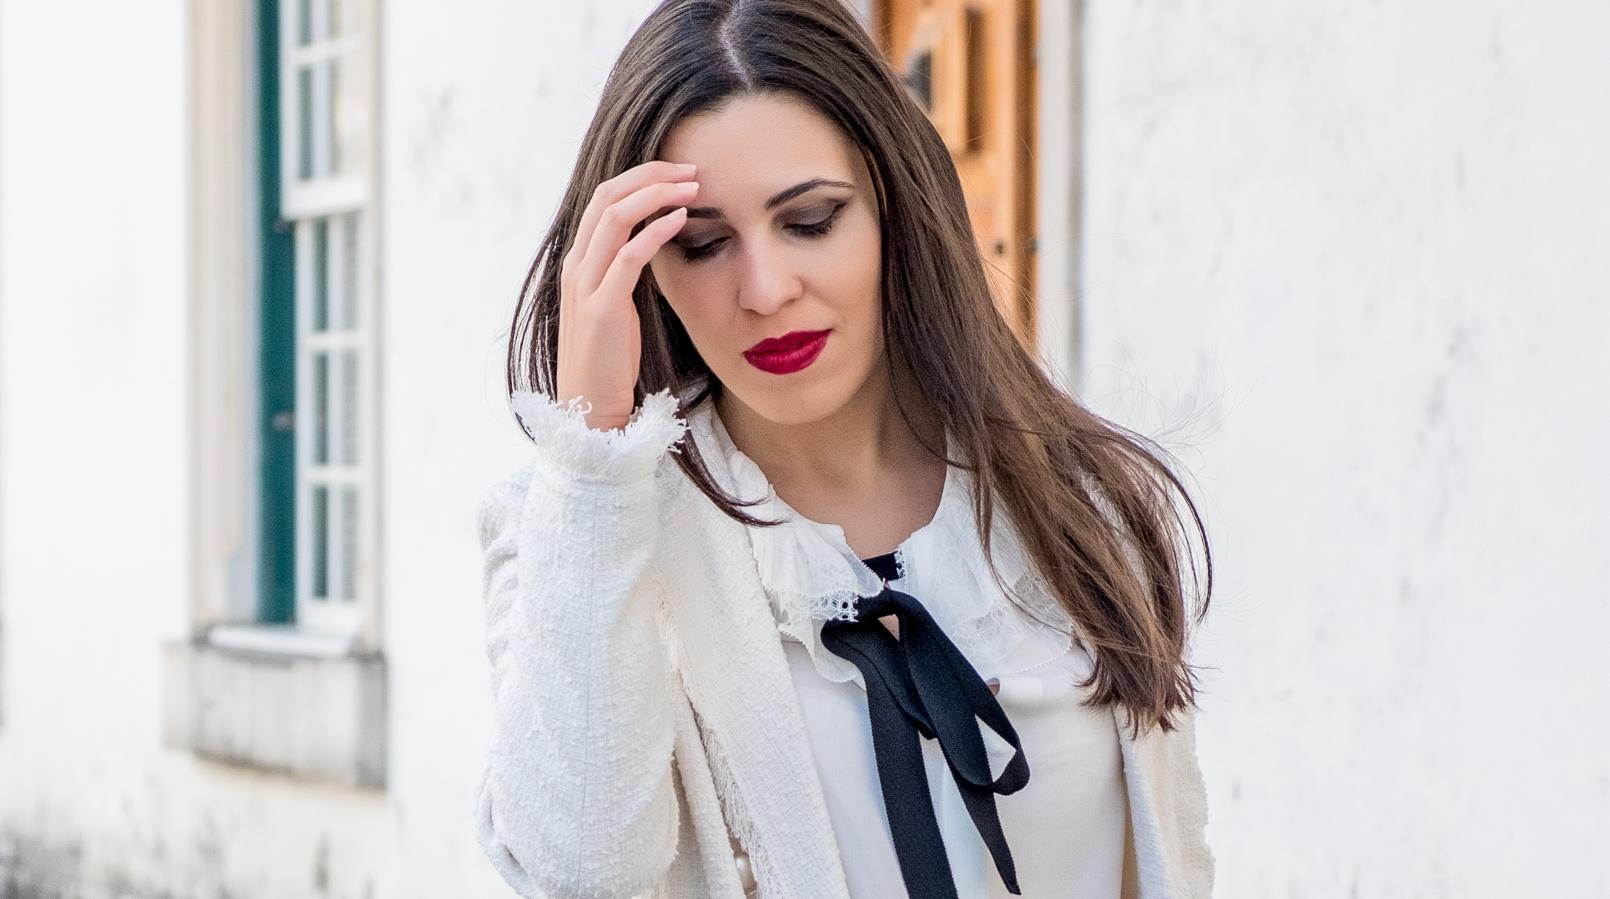 Le Fashionaire Comprei uns sapatos brancos, e agora? blogueira catarine martins casaco branco tweed comprido botoes perolas zara camisa seda branca laco preto folhos rendas seda massimo dutti 3314F PT